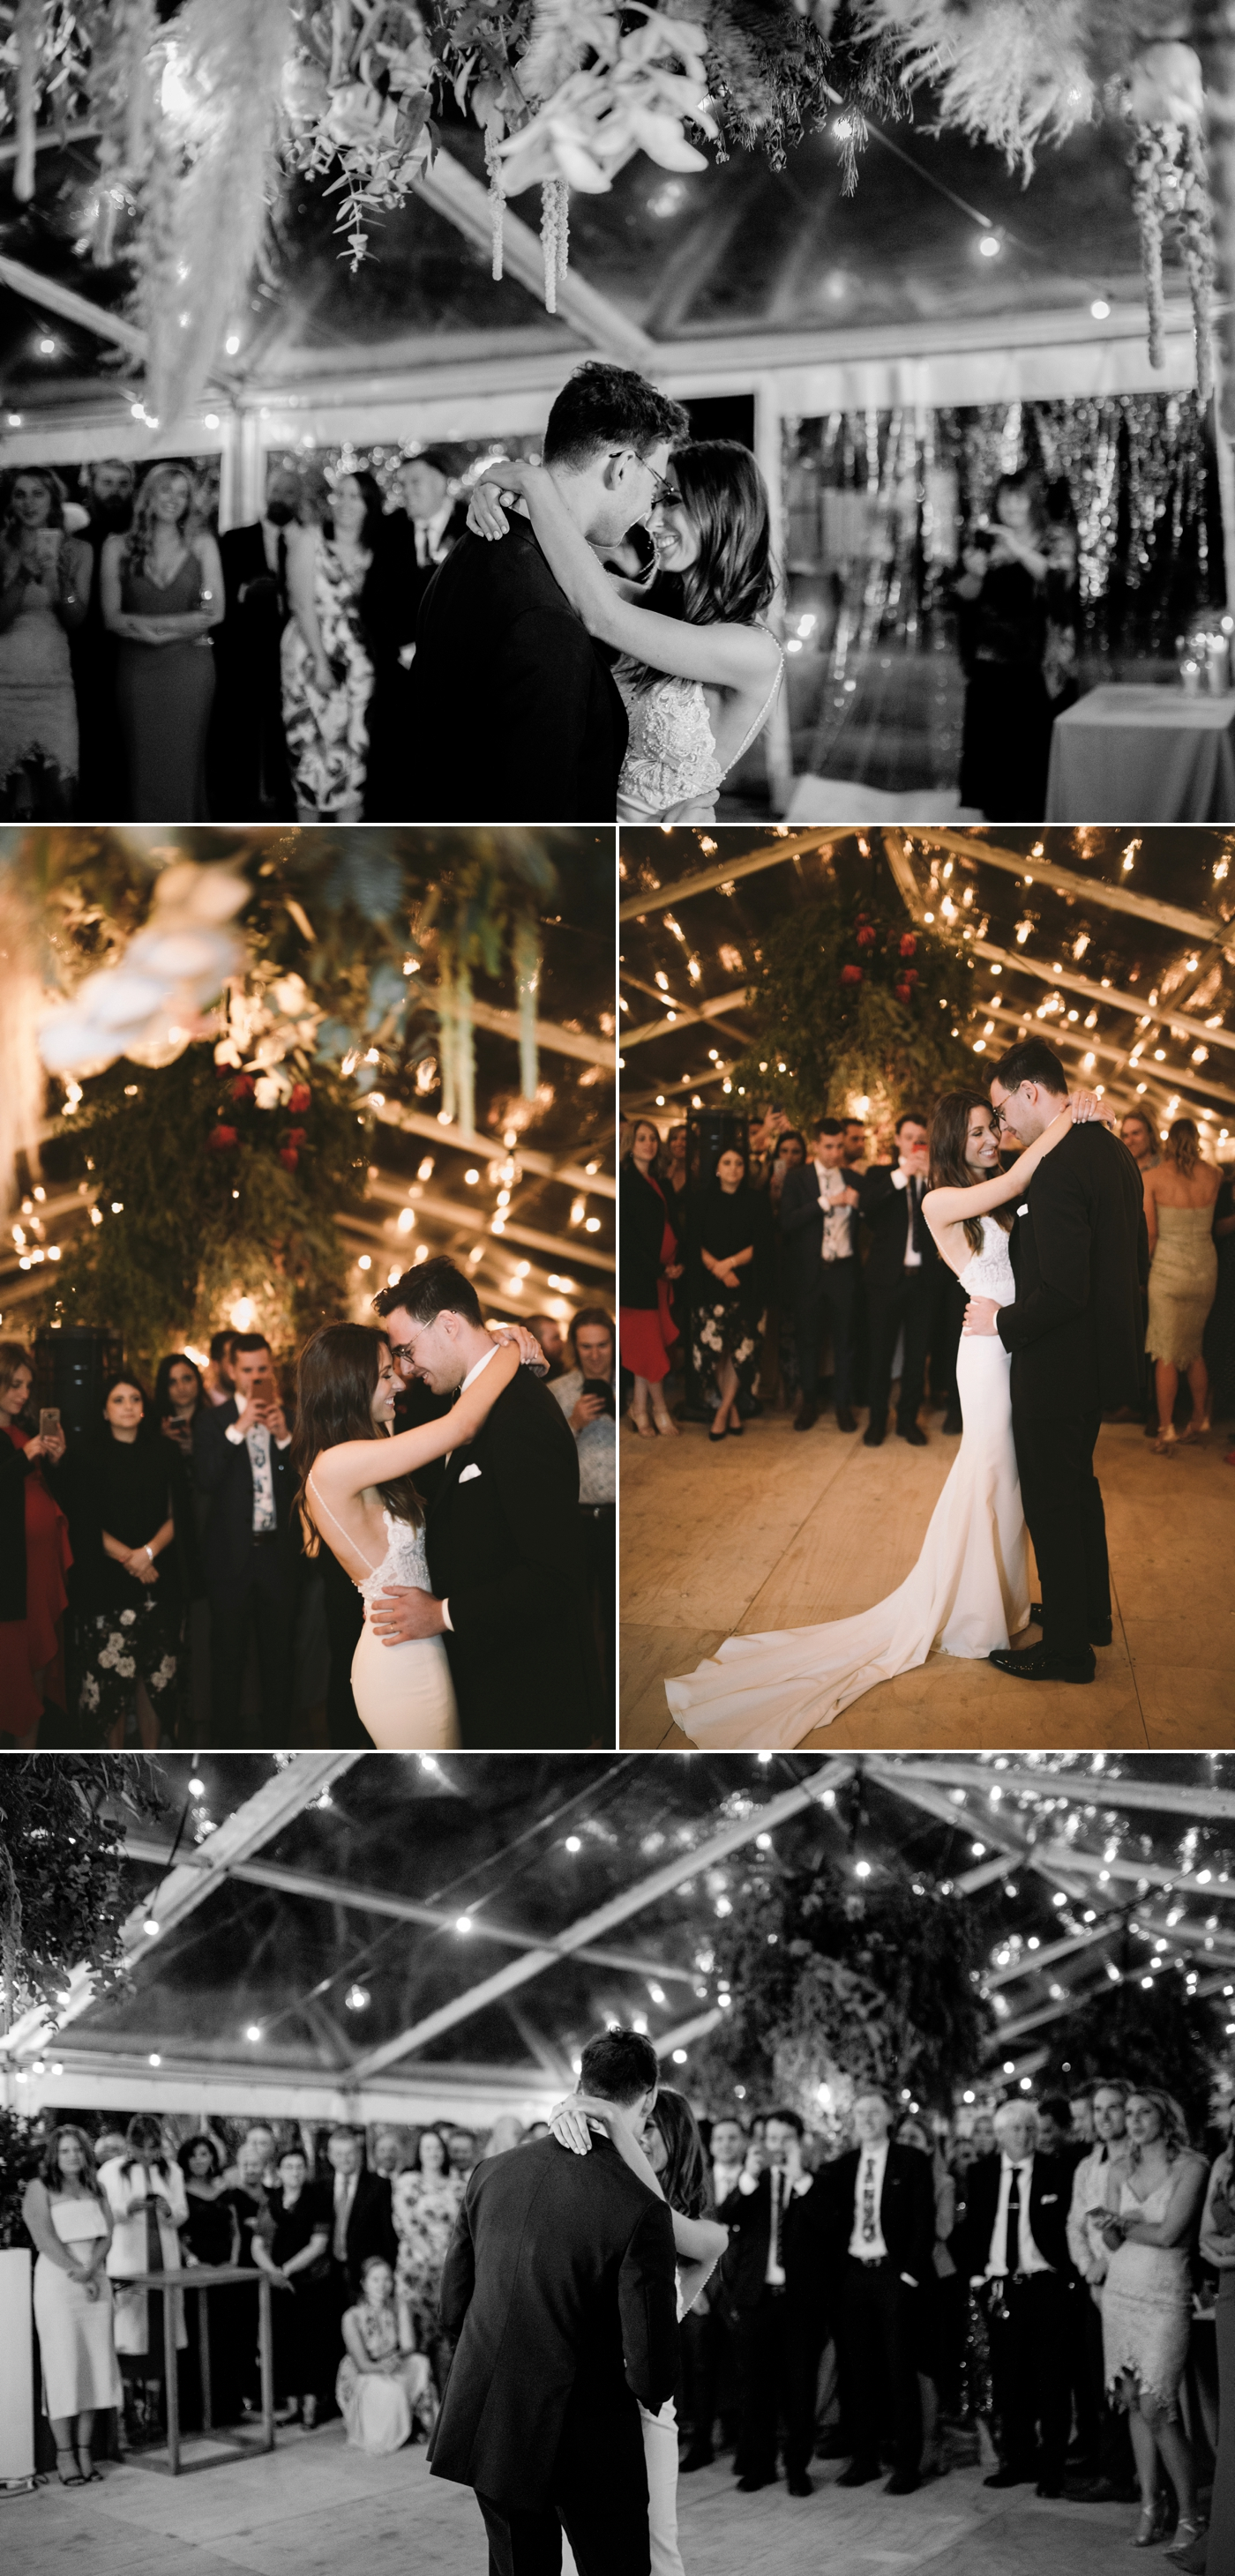 Katie and Ben - Natural Wedding Photography in Adelaide - Beautiful, Candid Wedding Photographer - Adelaide Hills Wedding - Katherine Schultz - www.katherineschultzphotography.com_0077.jpg